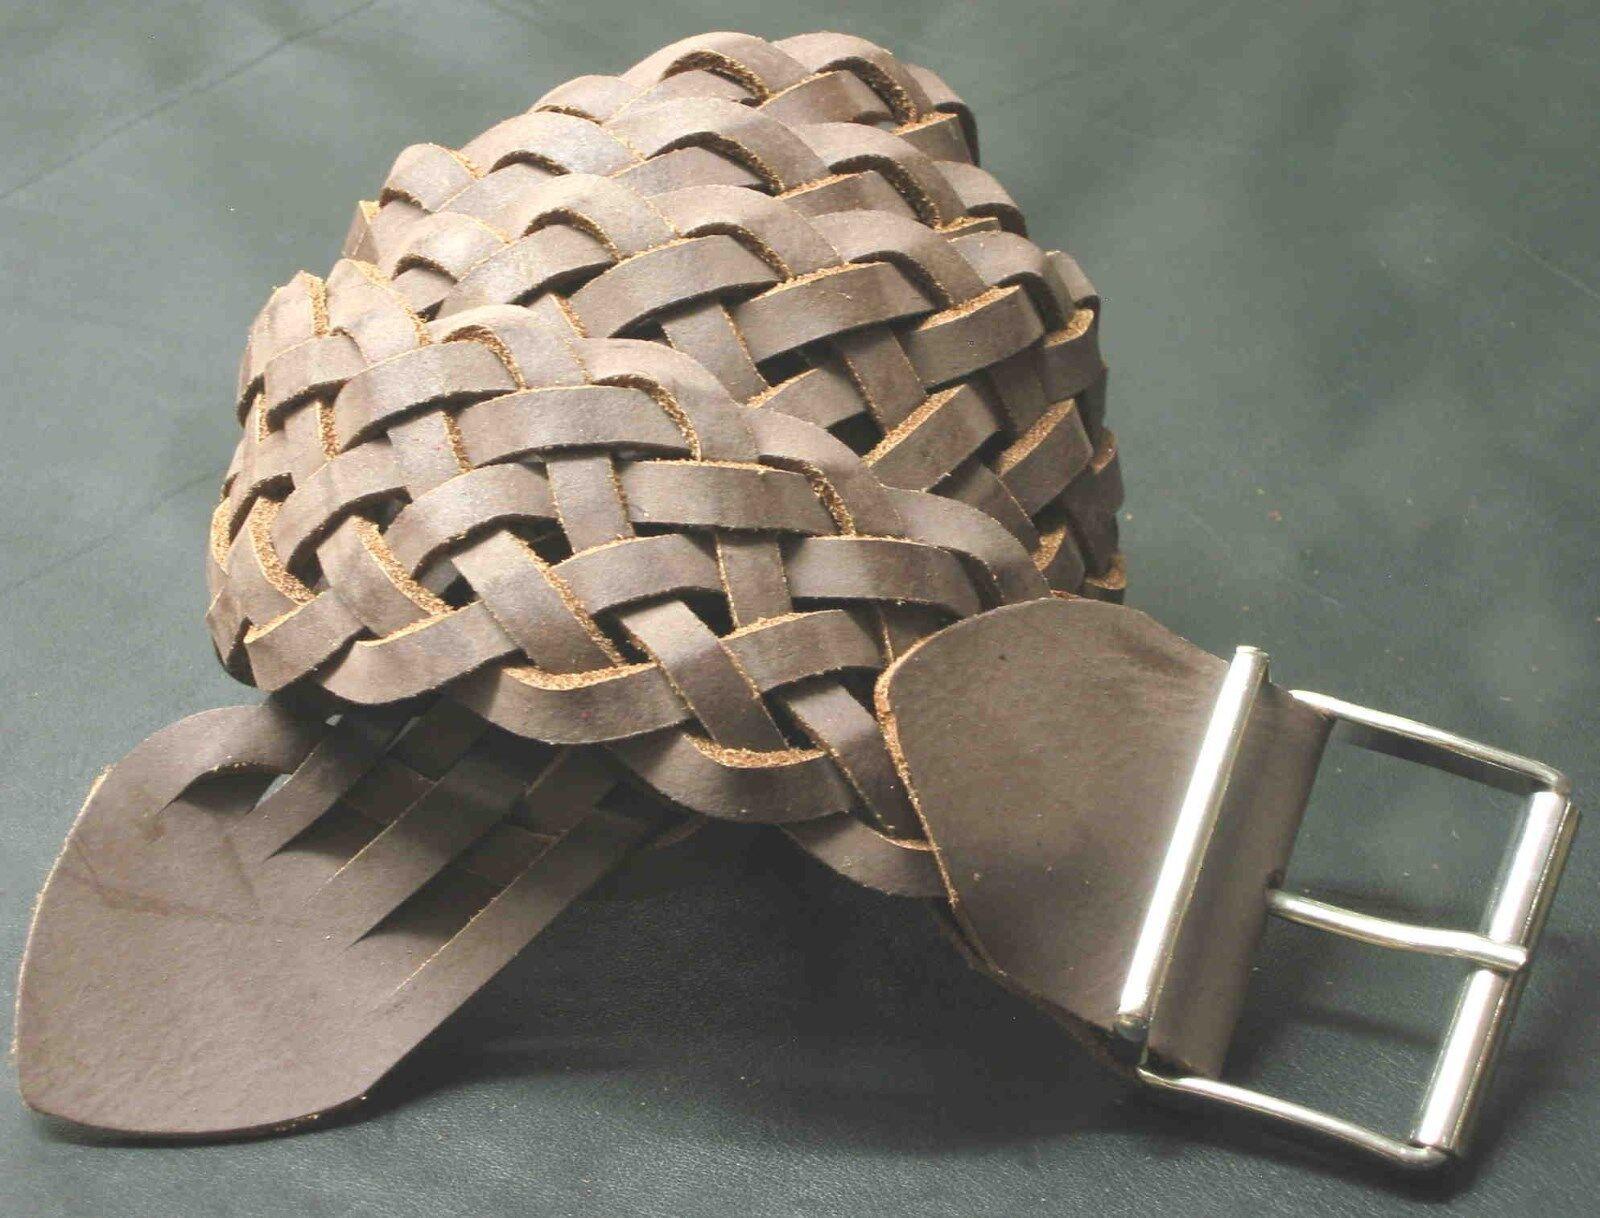 1A SATTLERARBEIT Ledergürtel LEDER Flechtgürtel NEU Gürtel 80-90cm BREITE: 5cm #